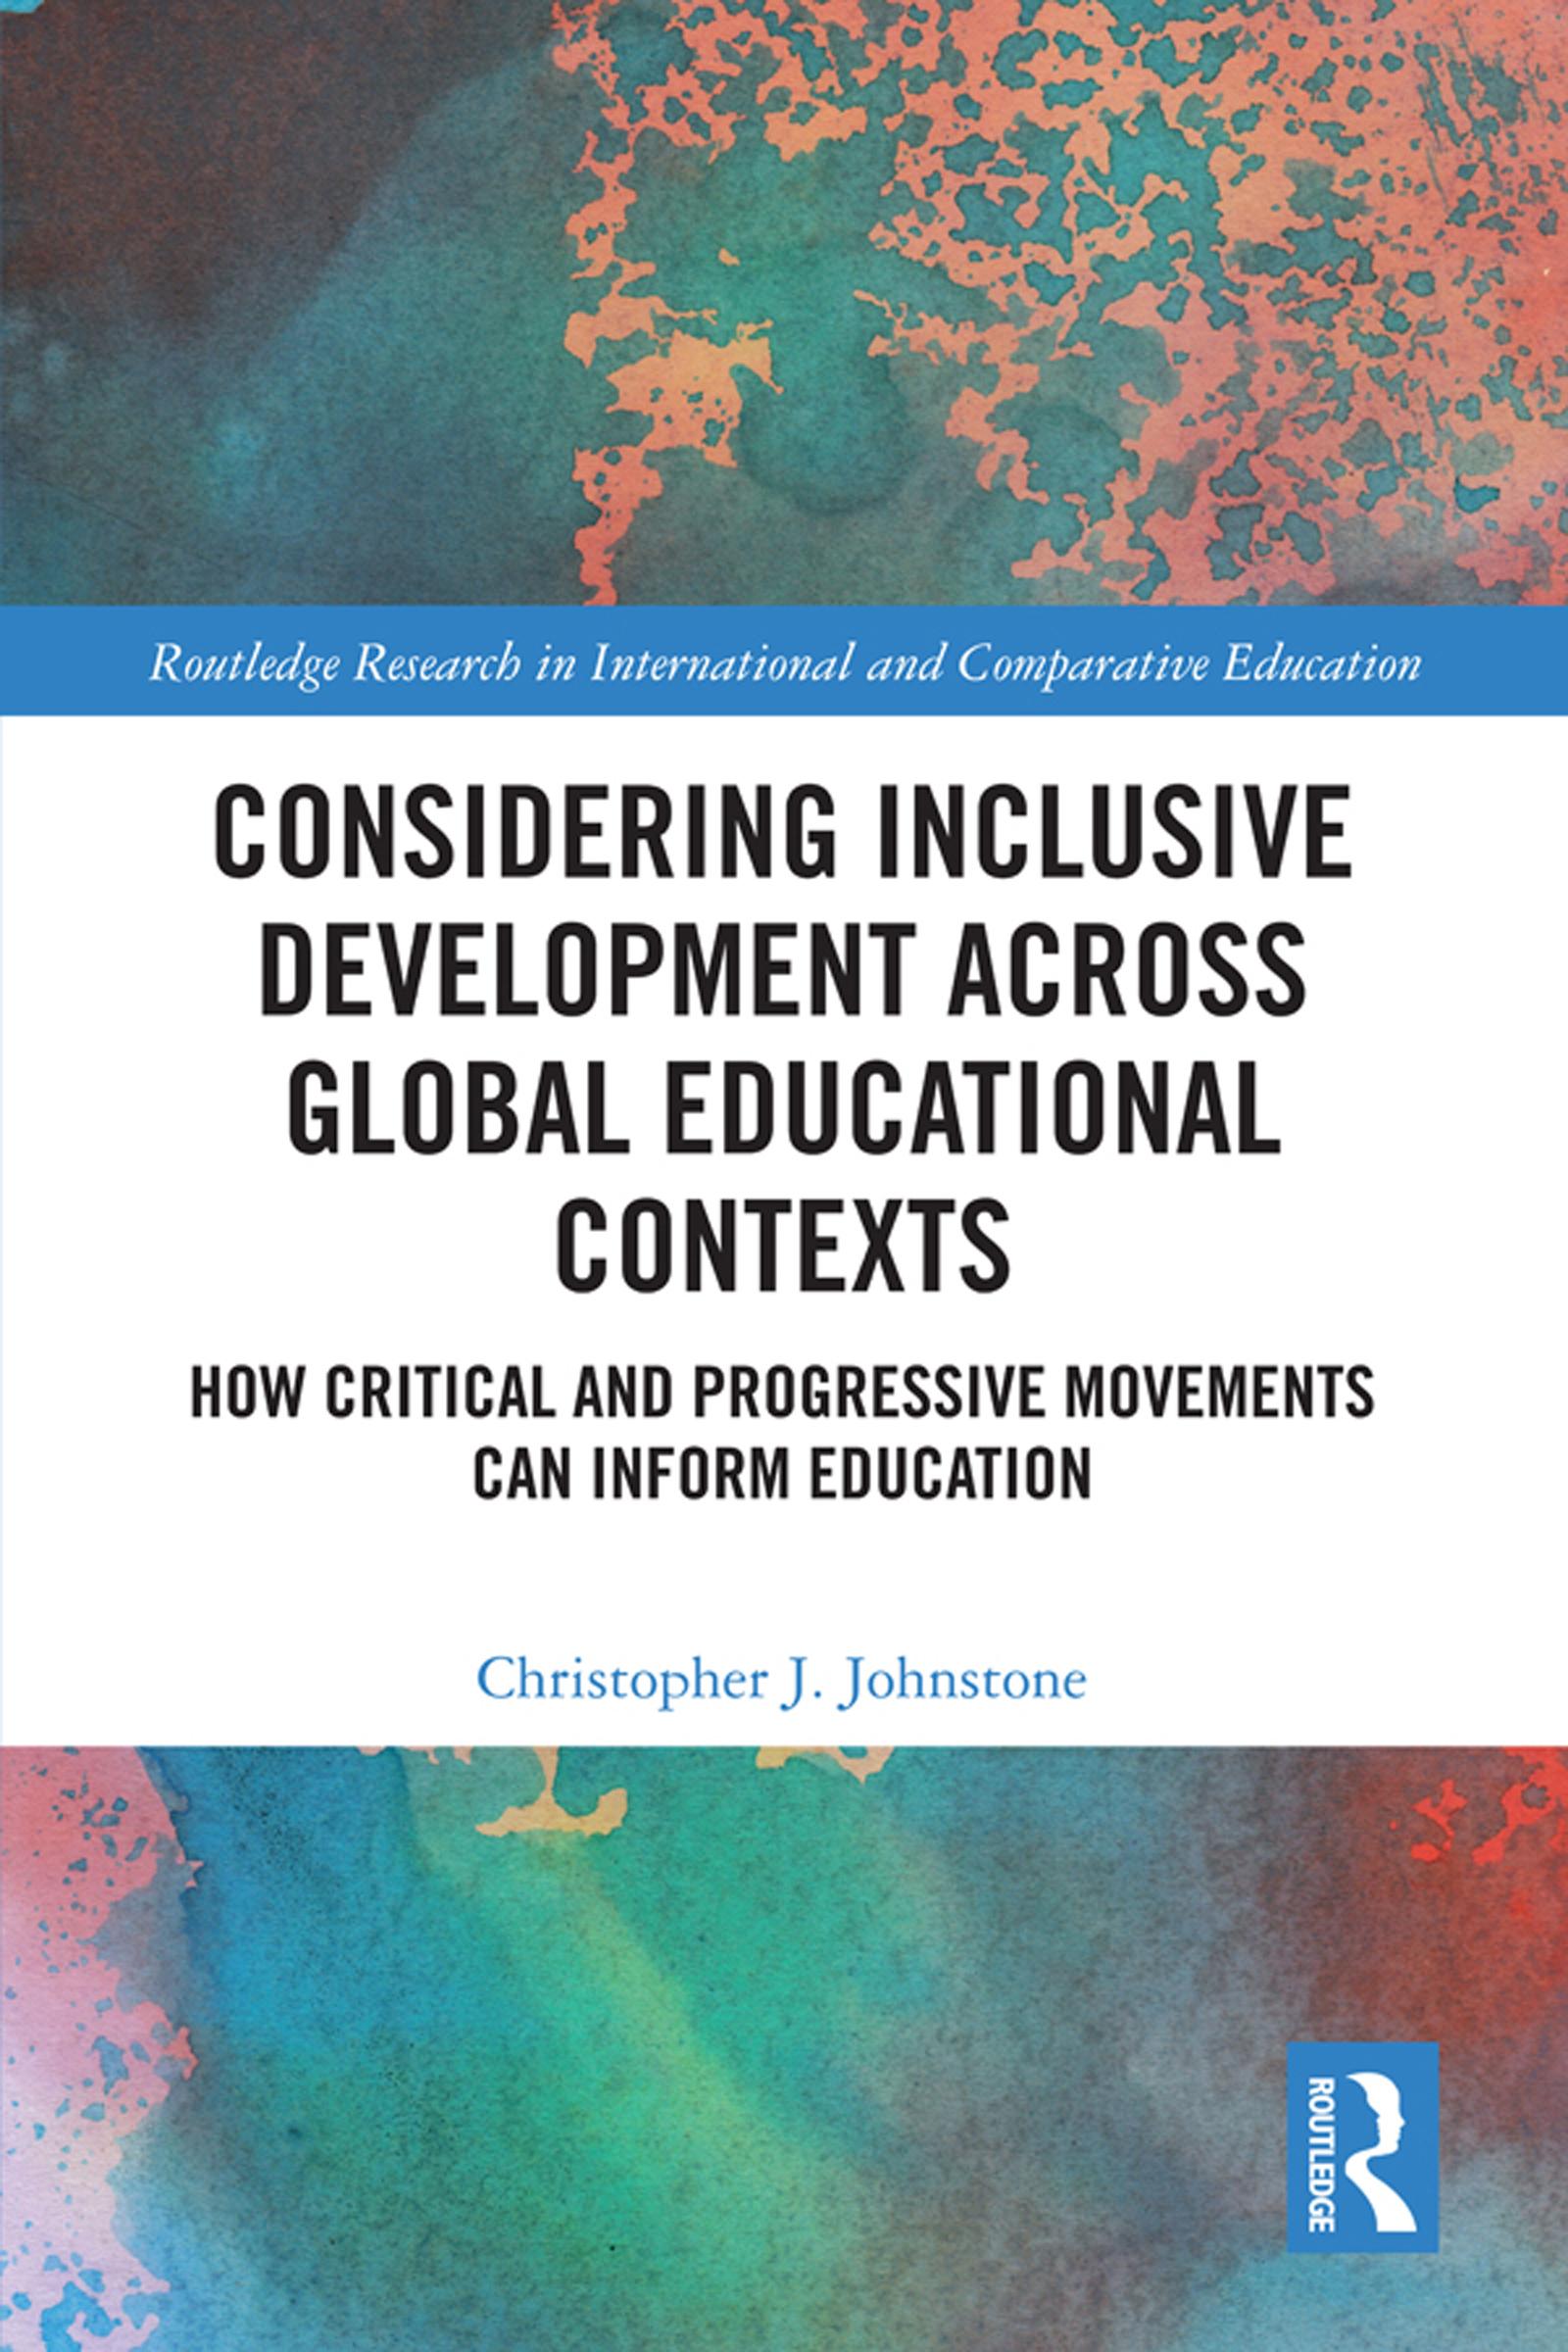 Considering Inclusive Development across Global Educational Contexts